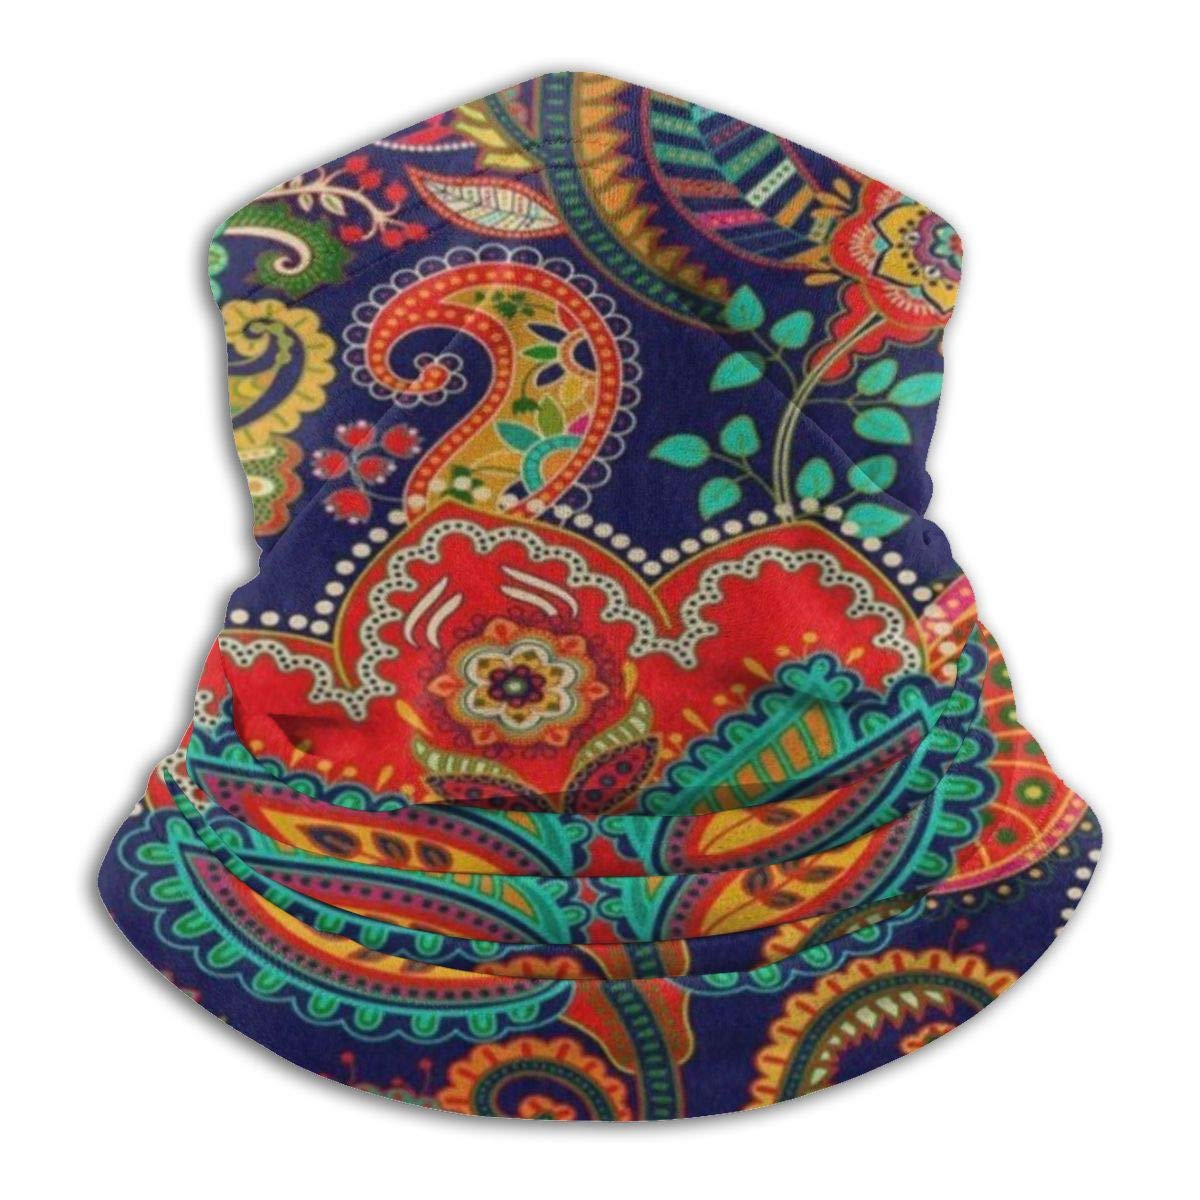 SLHFPX Paisley Floral Flower Ethnic Headband Womens Bandana Mens Balaclava,Neck Warmer,Face Mask,Sweatband Headwrap